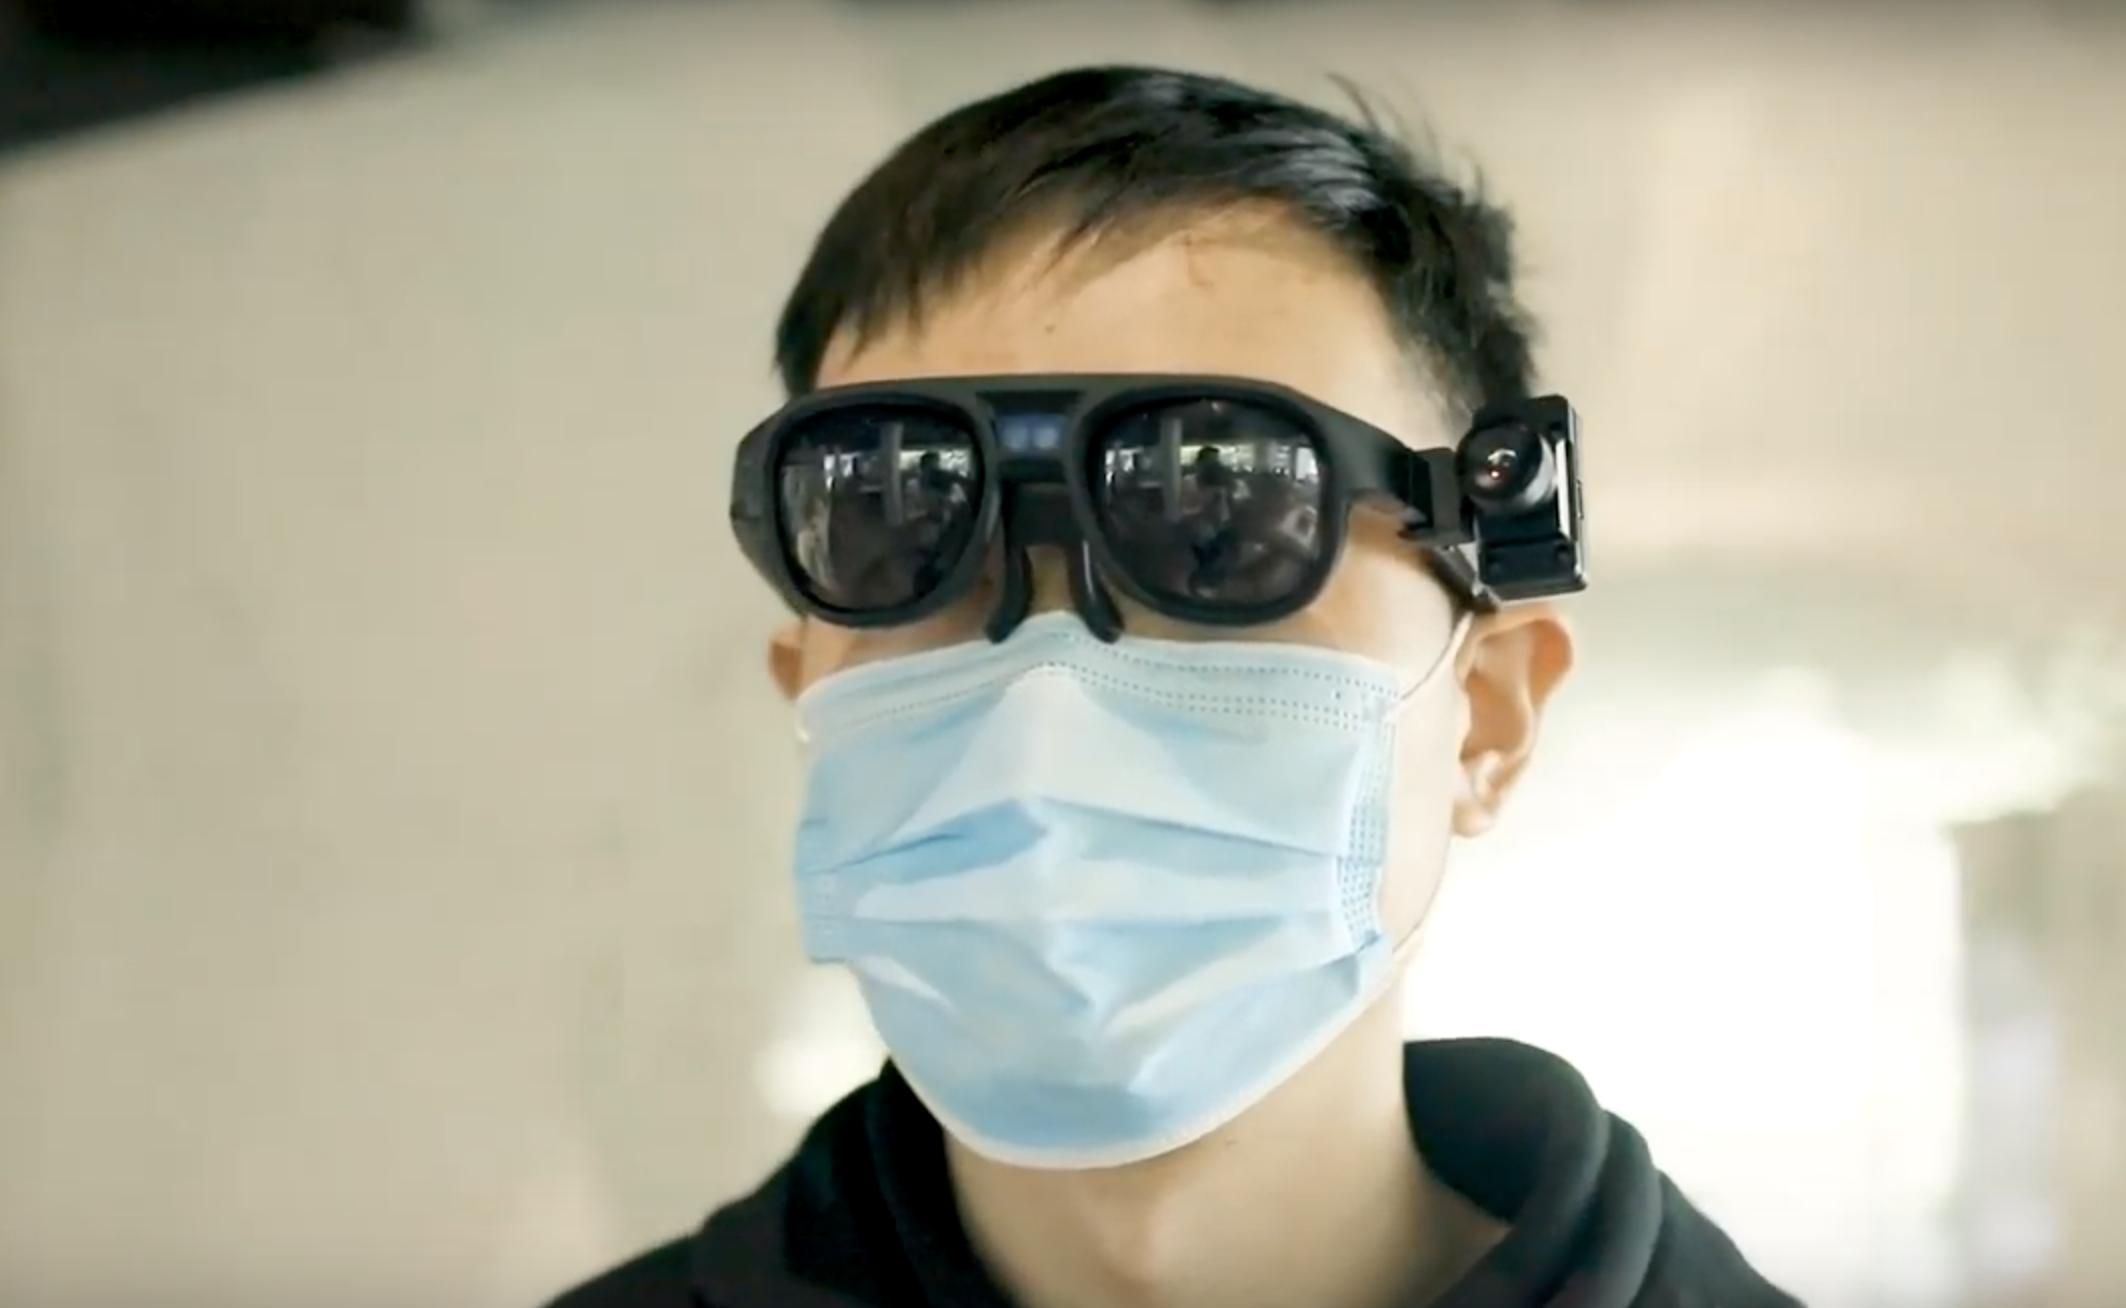 Rokid Smart Glasses Help to Prevent Covid Spread